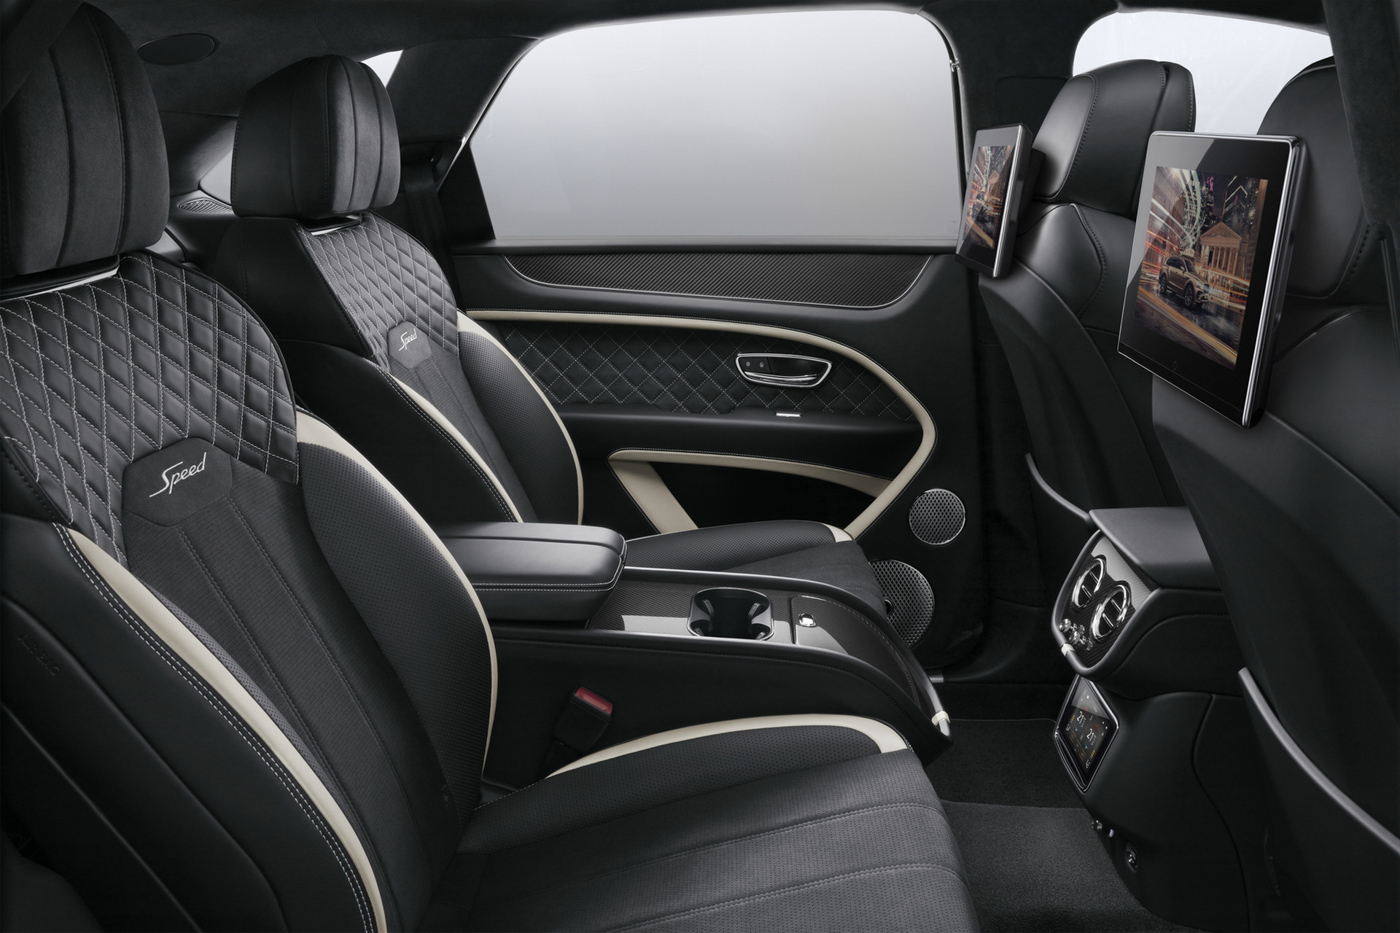 Bentley Rear Entertaiment System (2).JPG